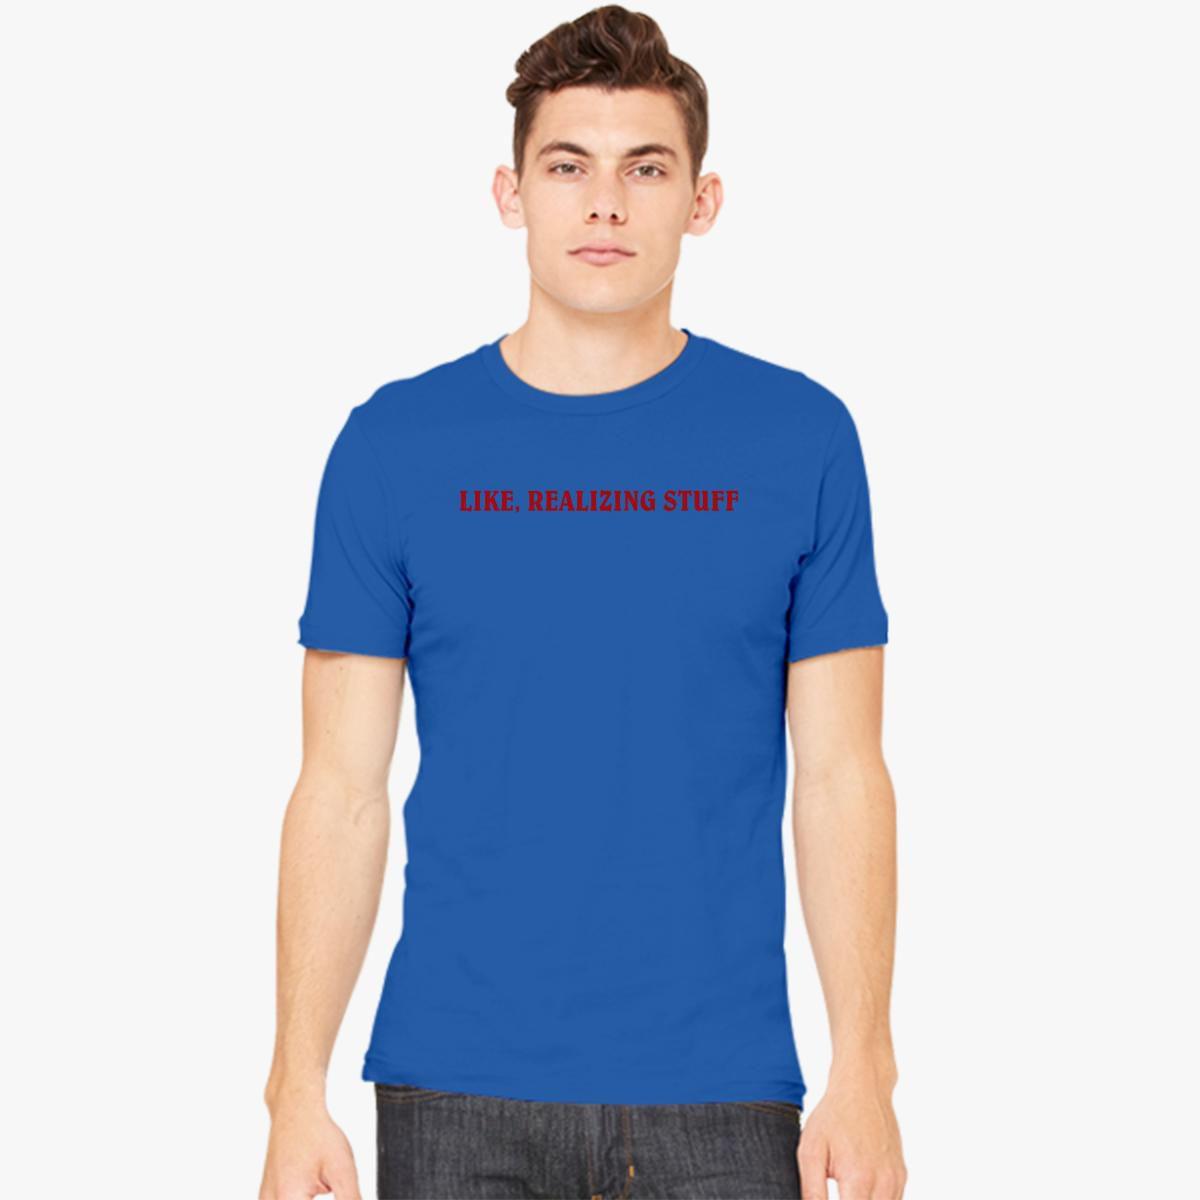 Christmas Kid T Shirt Mock Up: Like Realizing Stuff Men's T